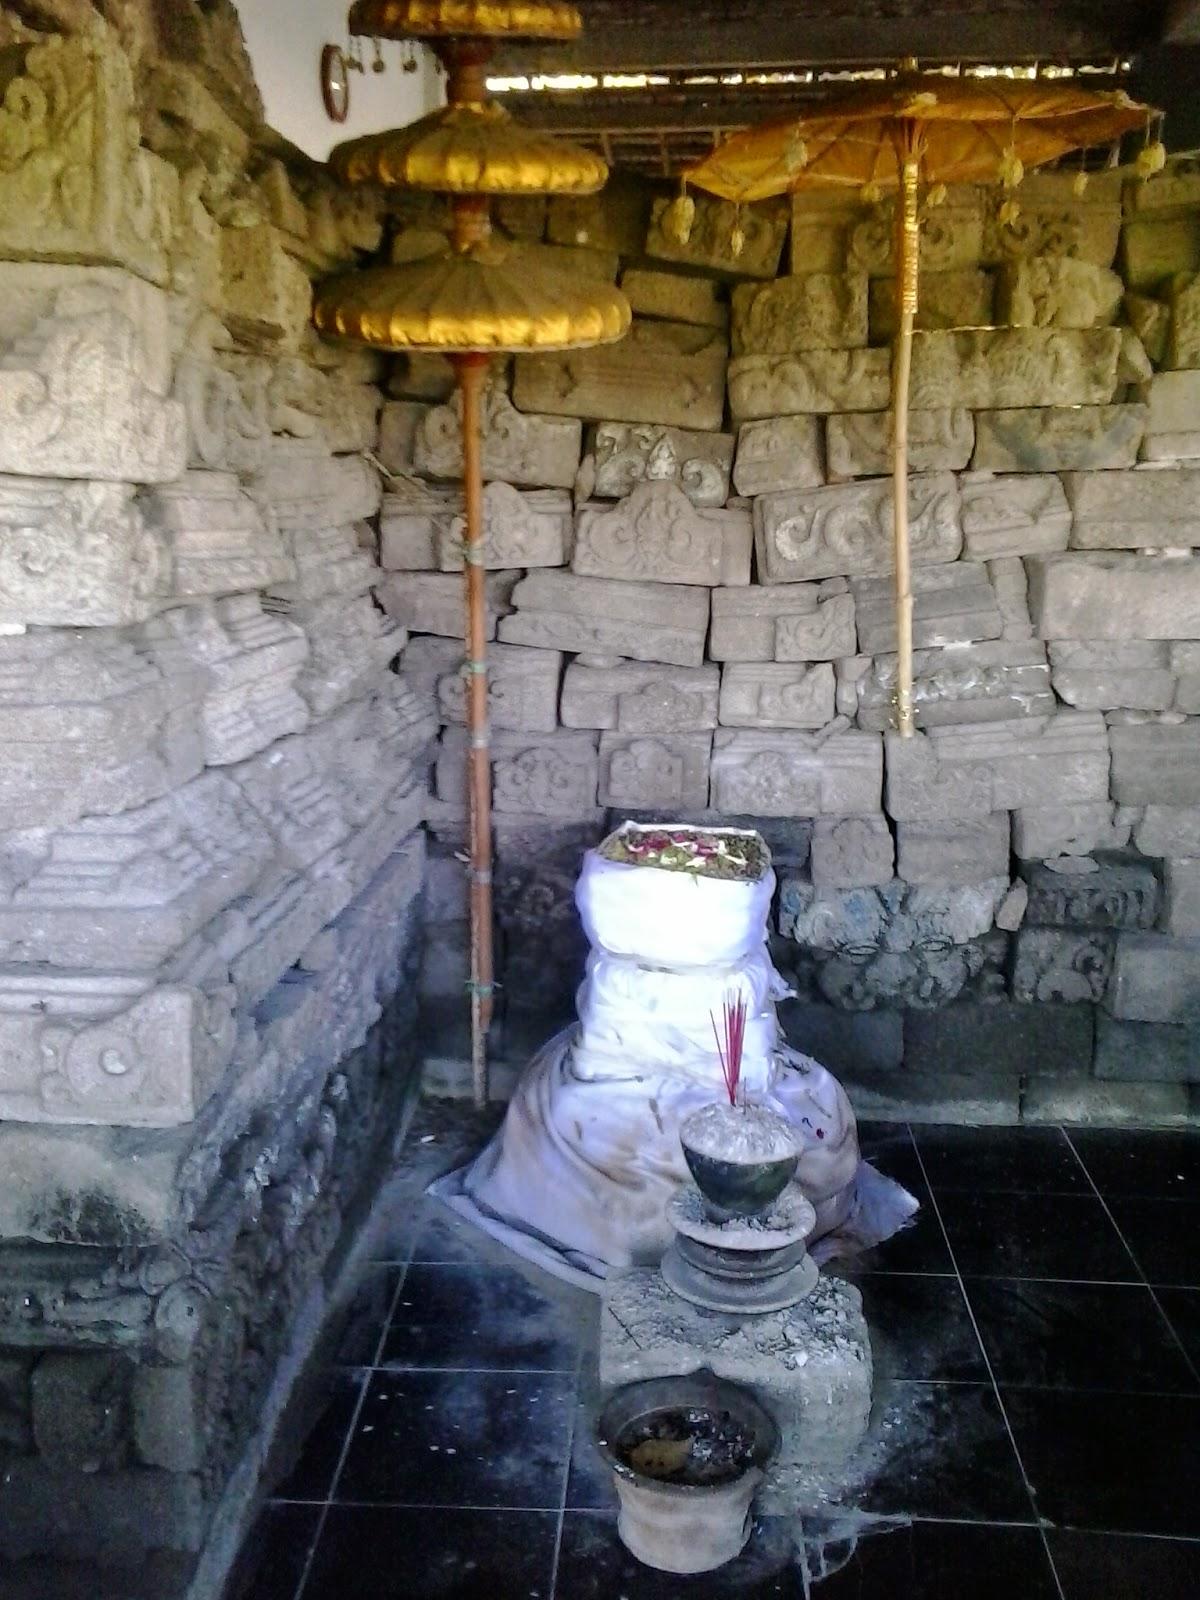 Kumpulan Artikel Bermanfaat Juli 2014 Candi Watu Tulis Terletak Desa